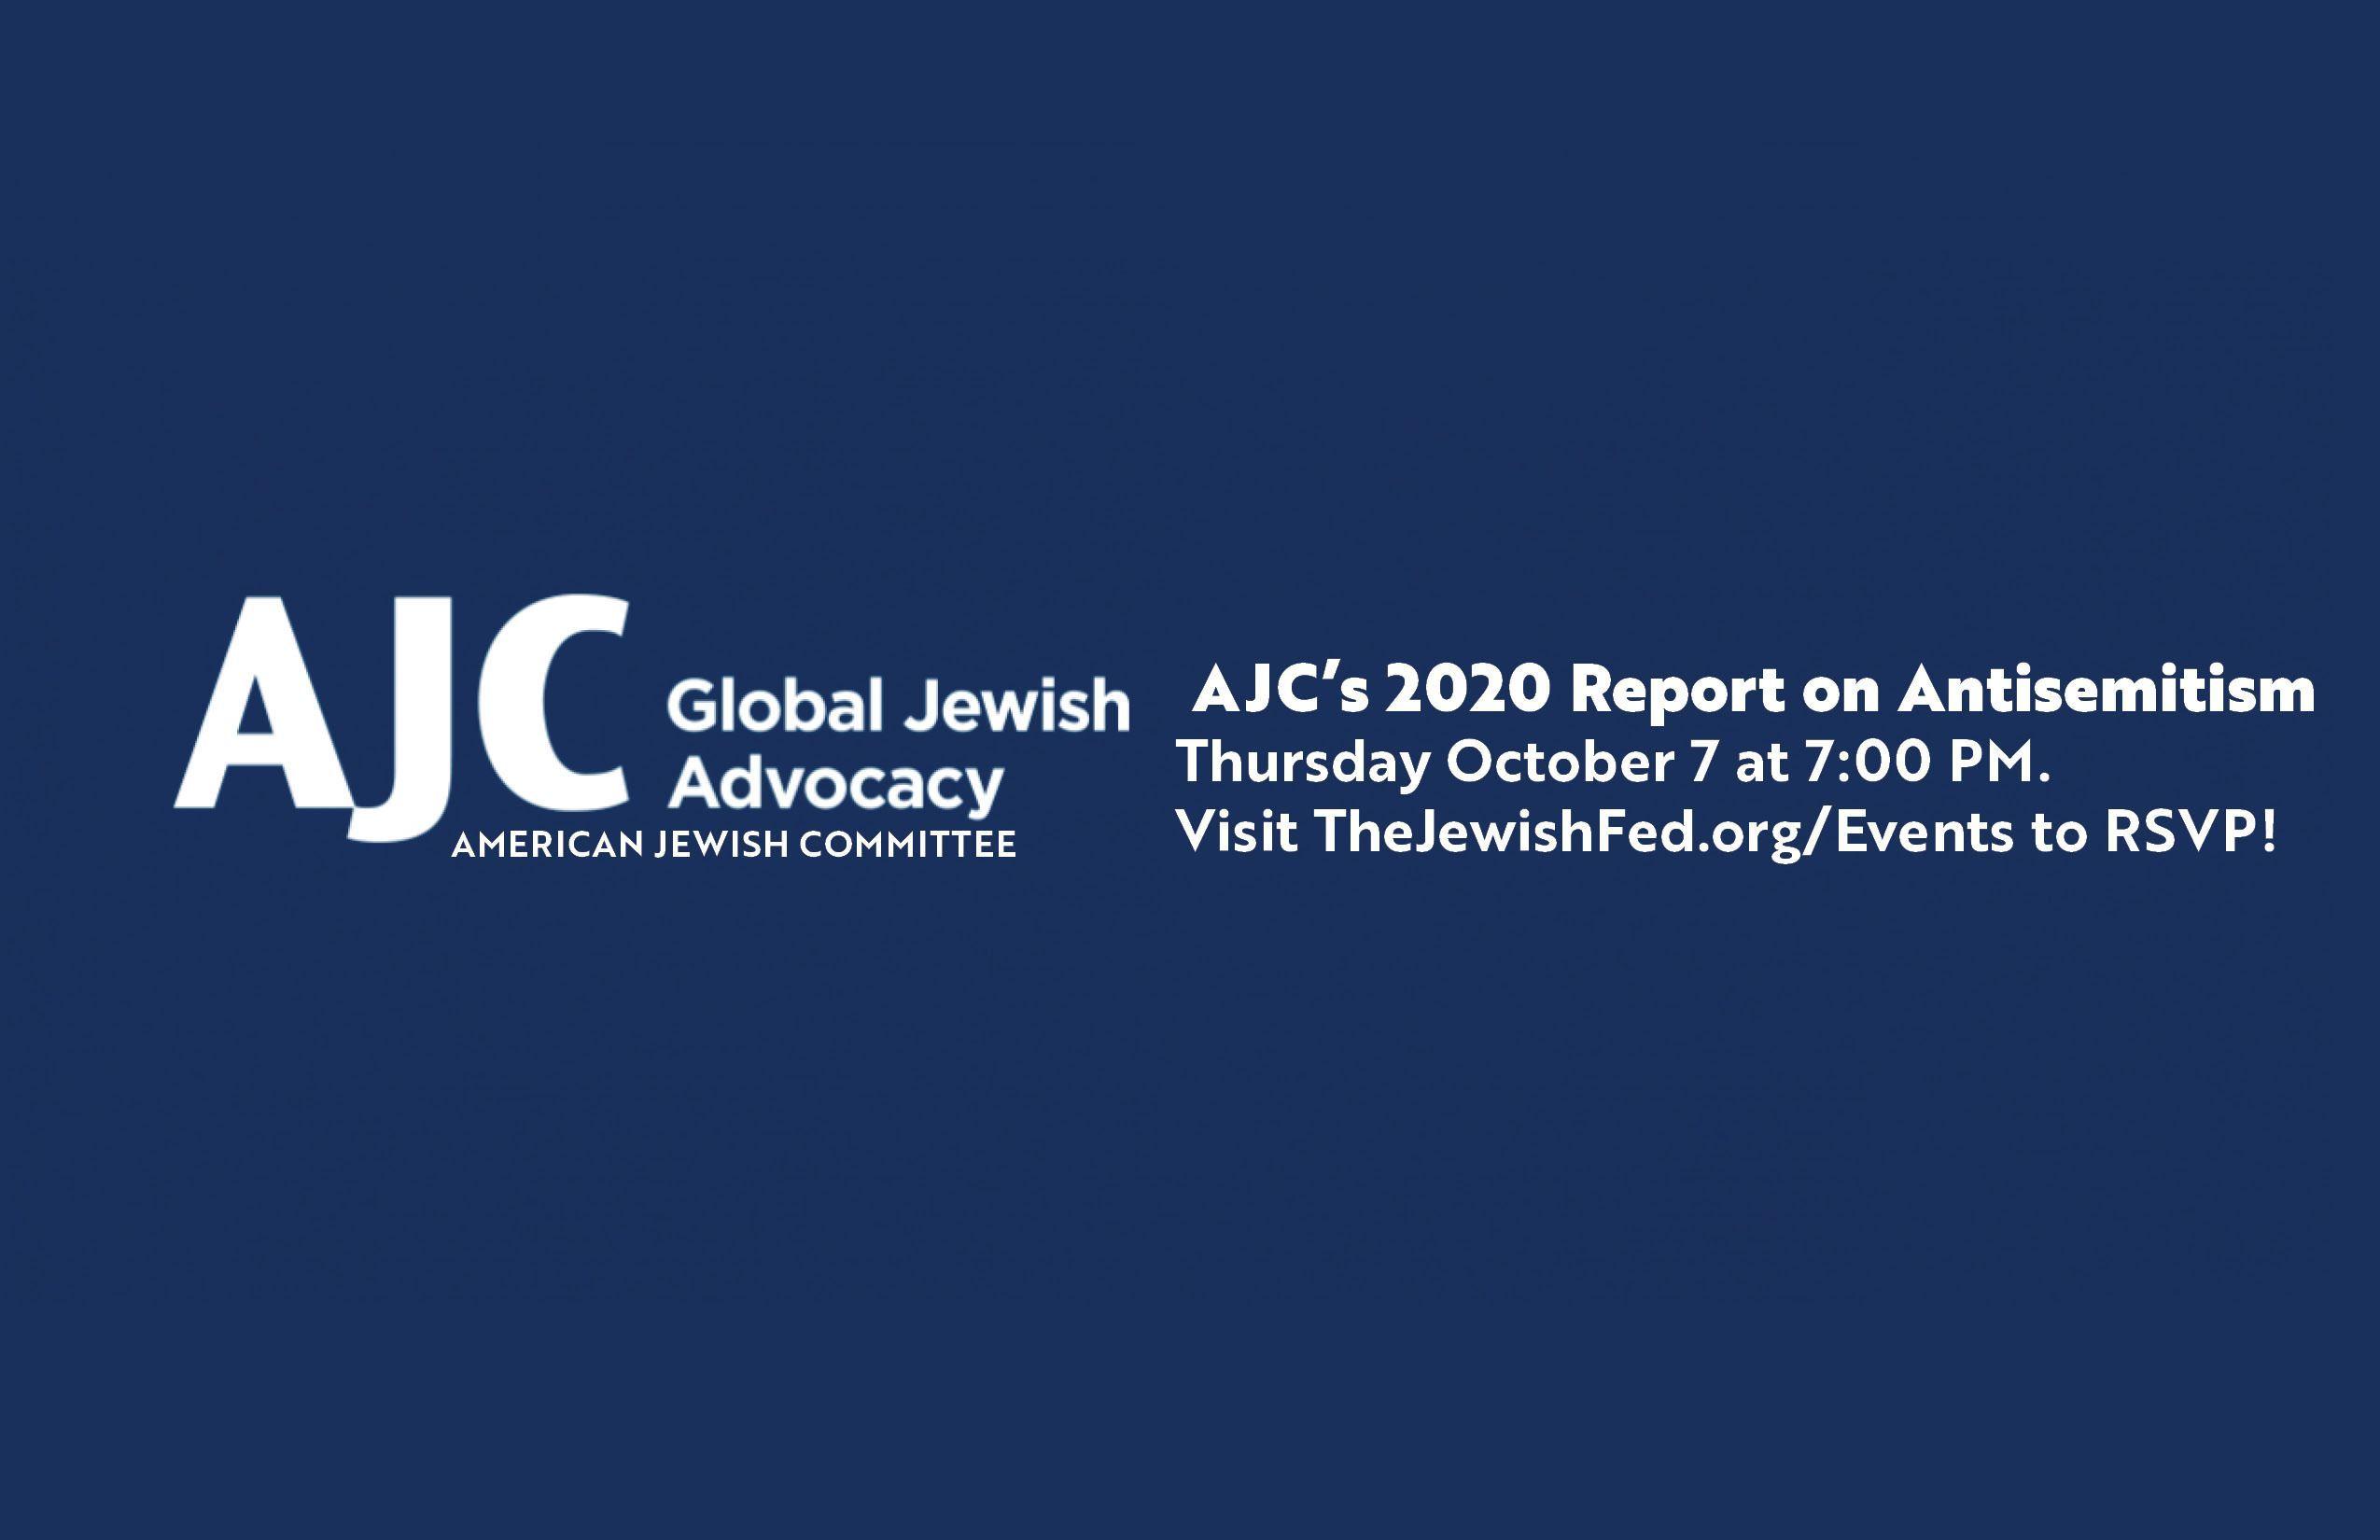 AJC's 2020 Survey on Antisemitism